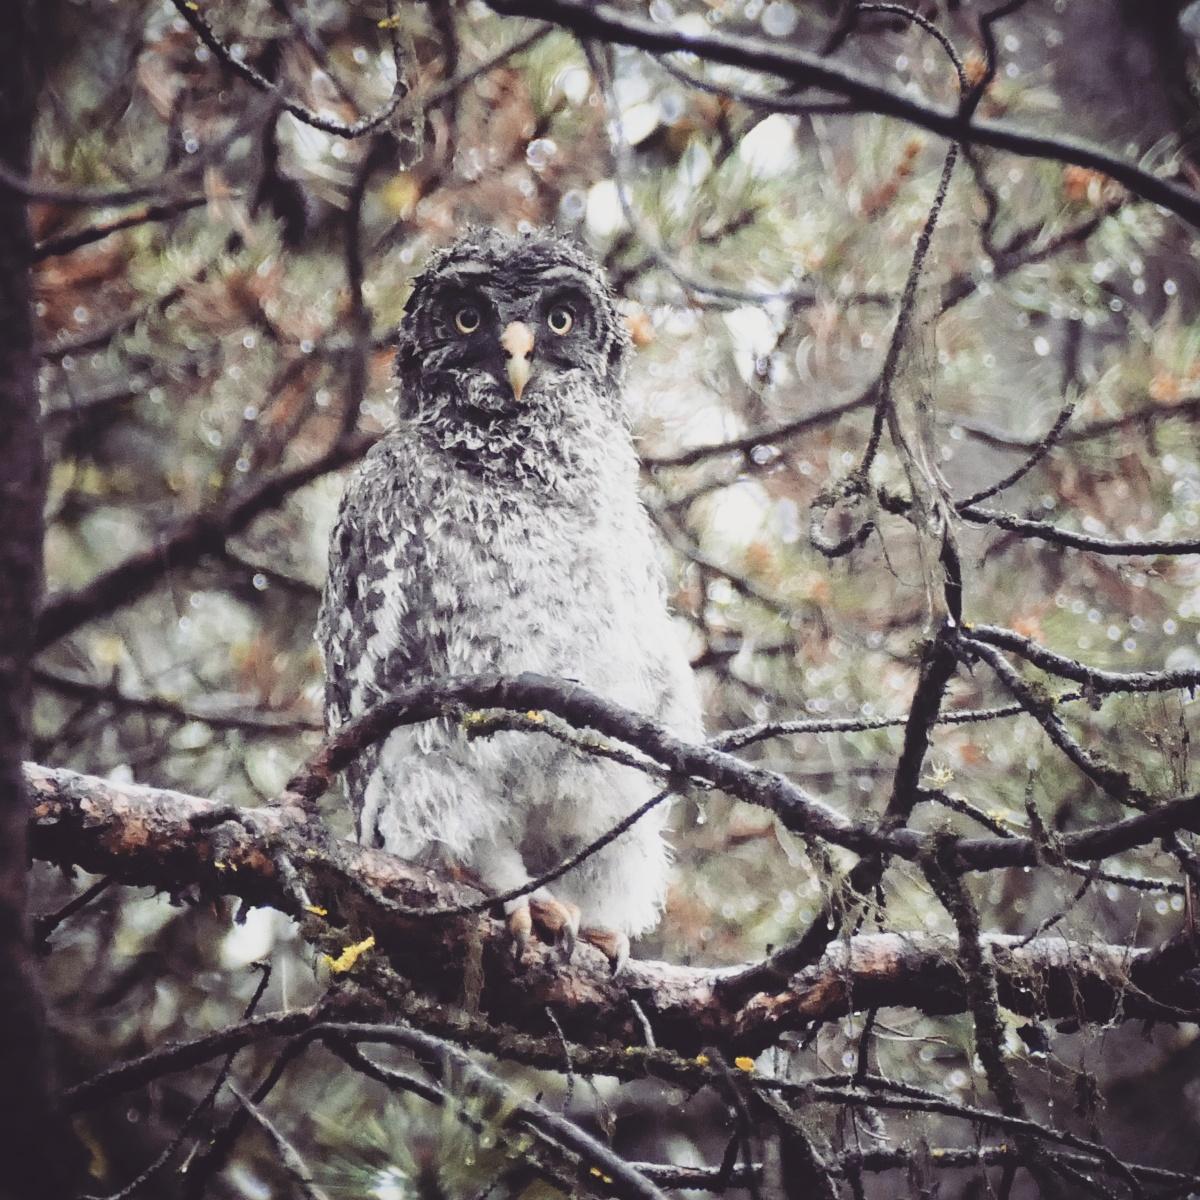 Noah's view of a waterlogged, adolescent Great Gray Owl. Noah Strycker